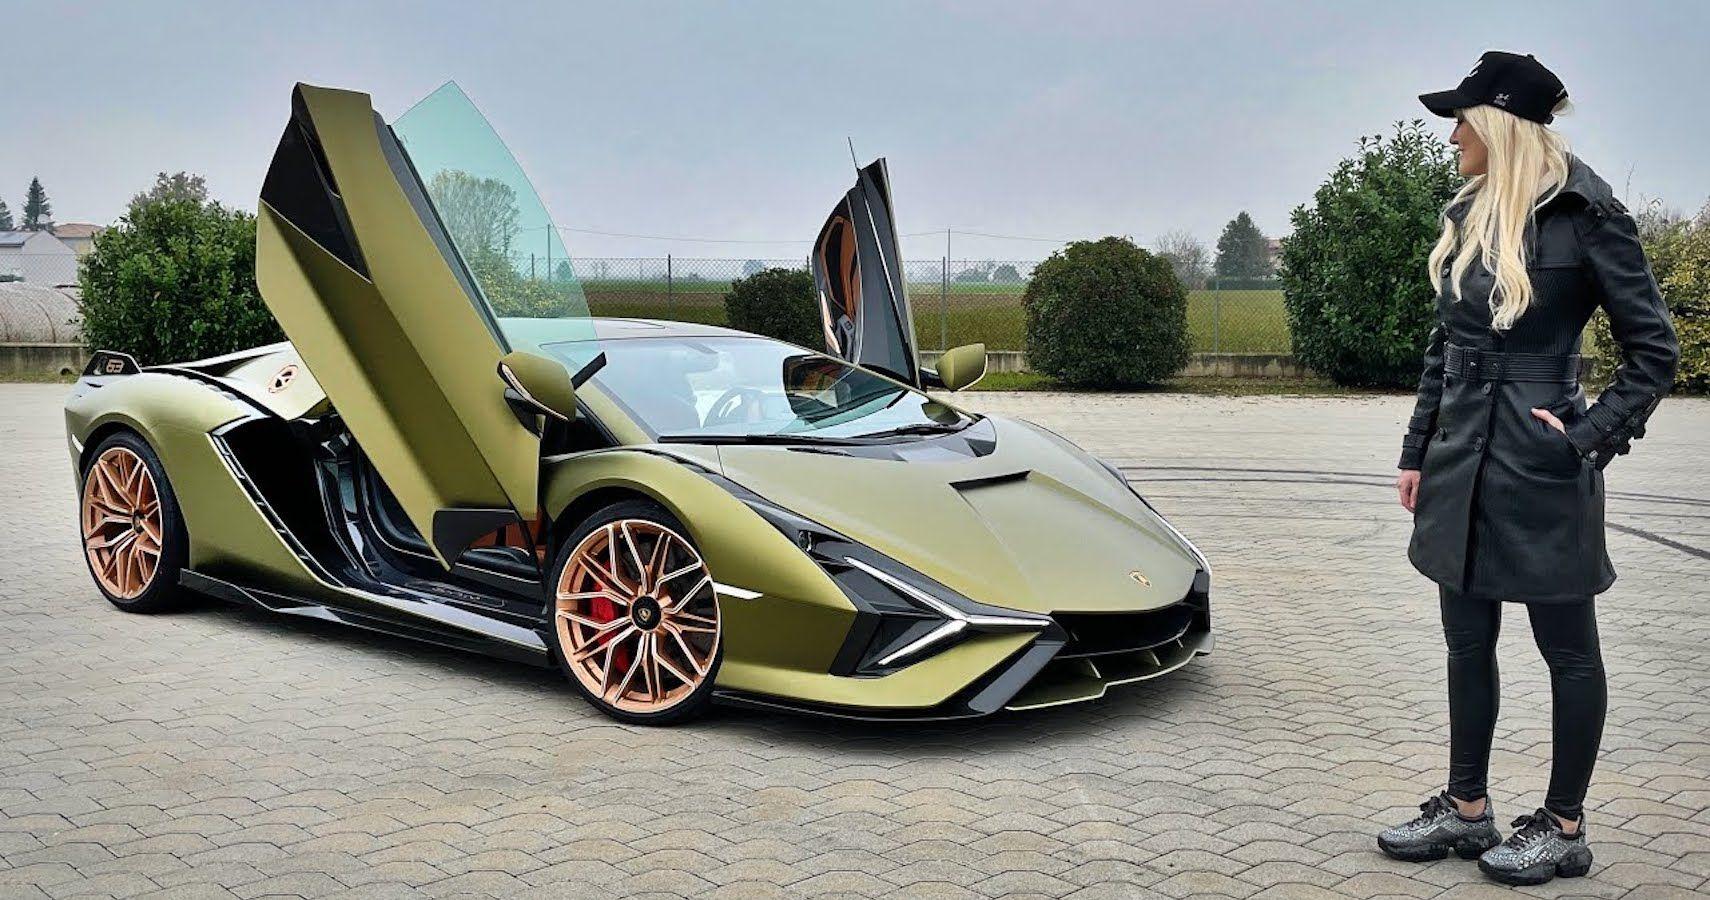 Lamborghini Invites Supercar Blondie To Drive First Supercapacitor-Based Hybrid Sian FKP 37